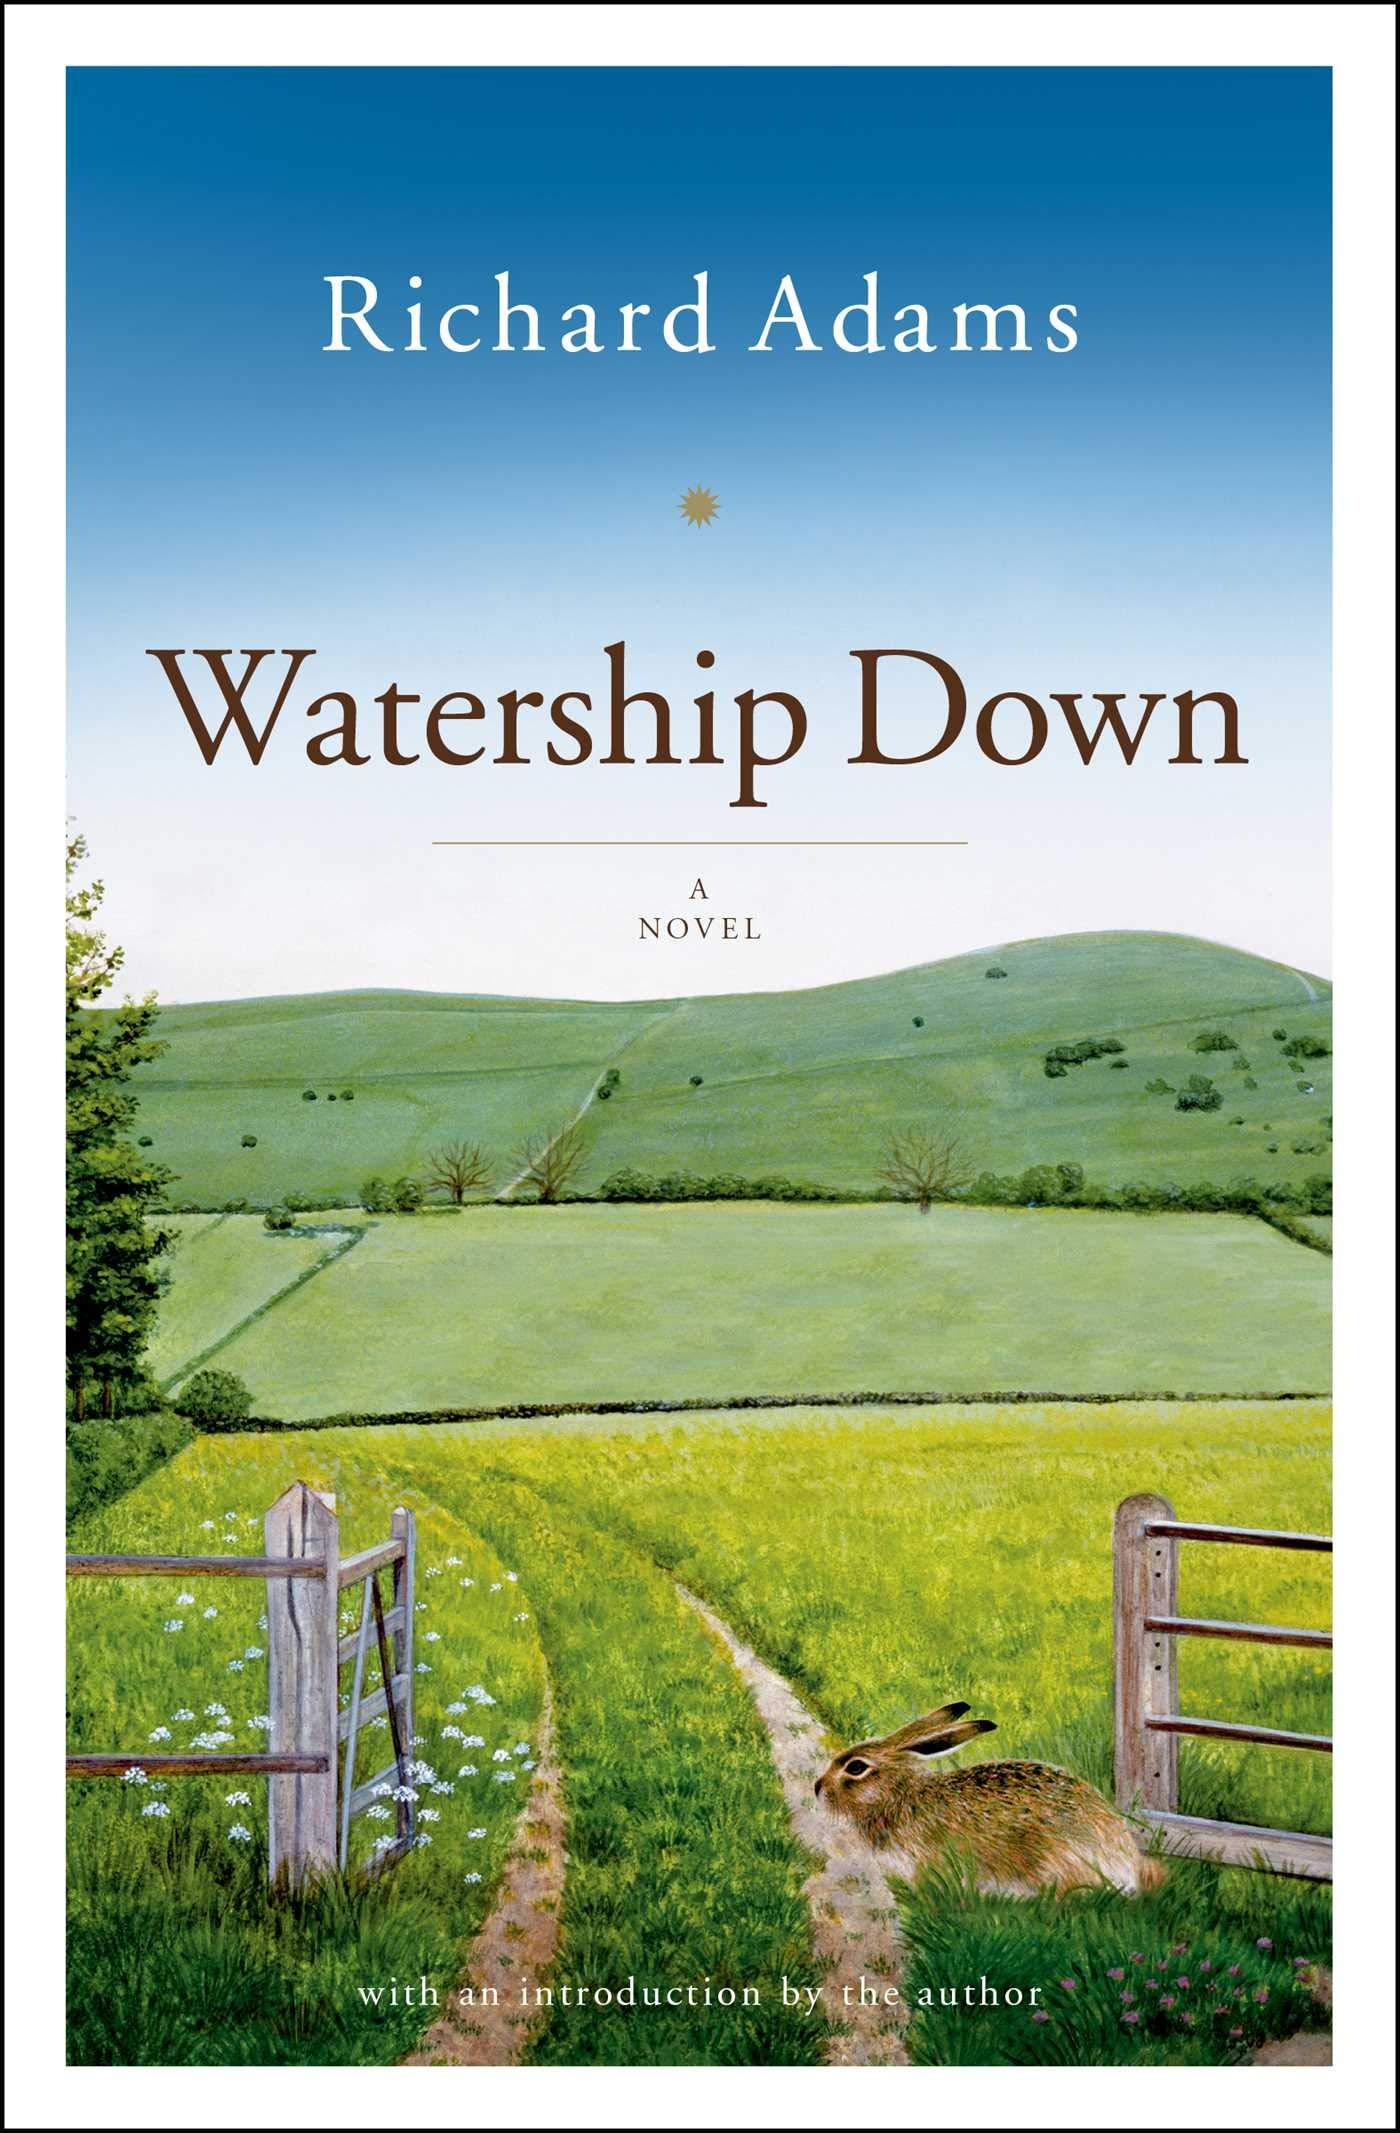 Watership Down: A Novel: Adams, Richard: 9780743277709: Amazon.com: Books